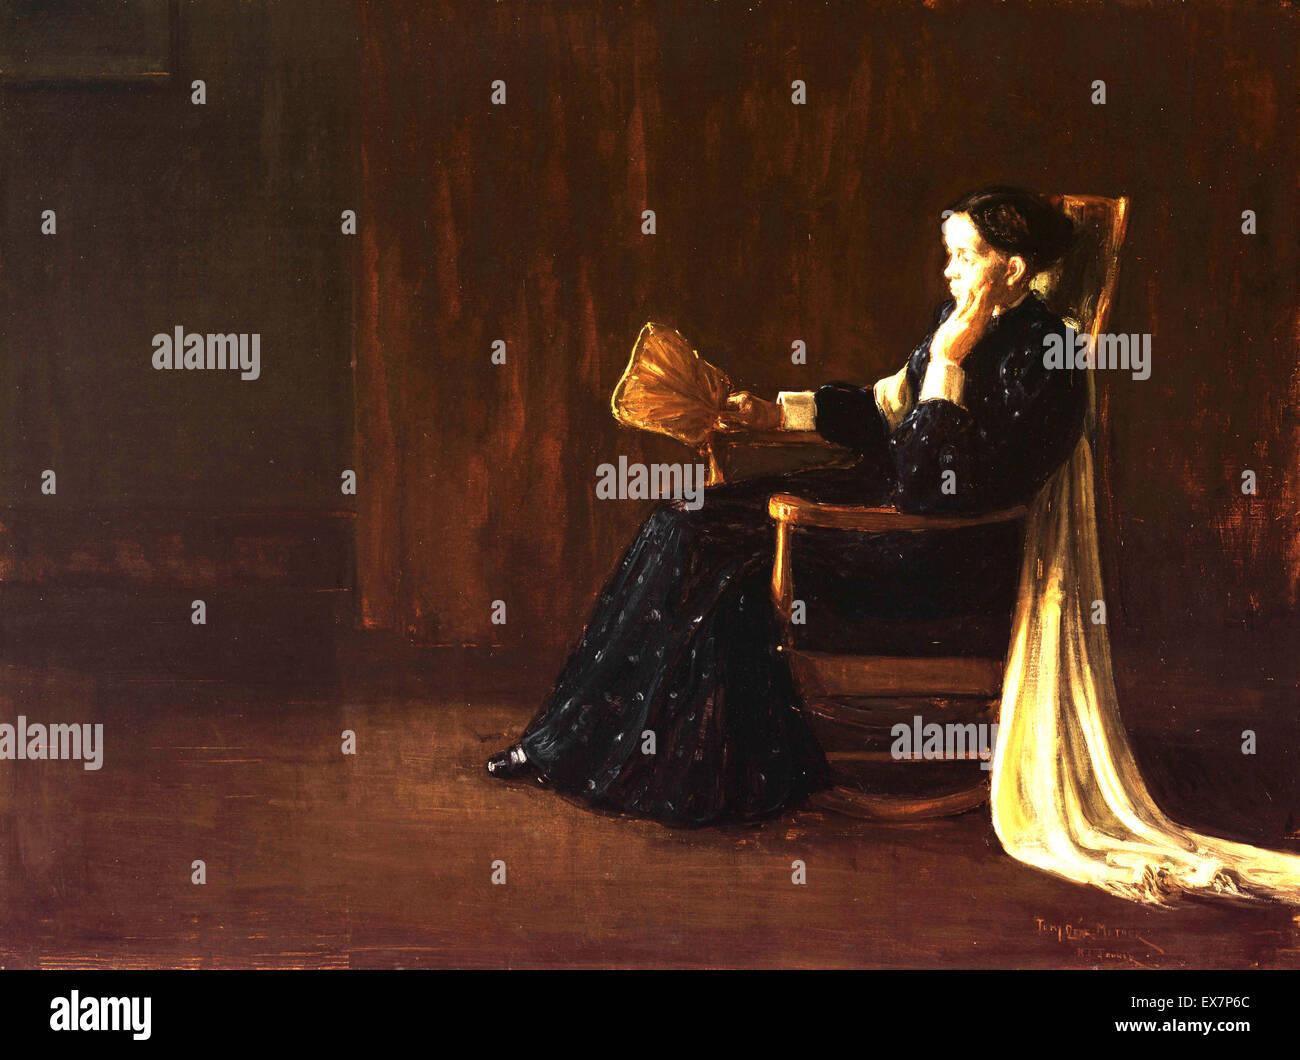 Henry Ossawa Tanner, Portrait of the Artist's Mother 1897 Oil on canvas. Philadelphia Museum of Art, USA. - Stock Image